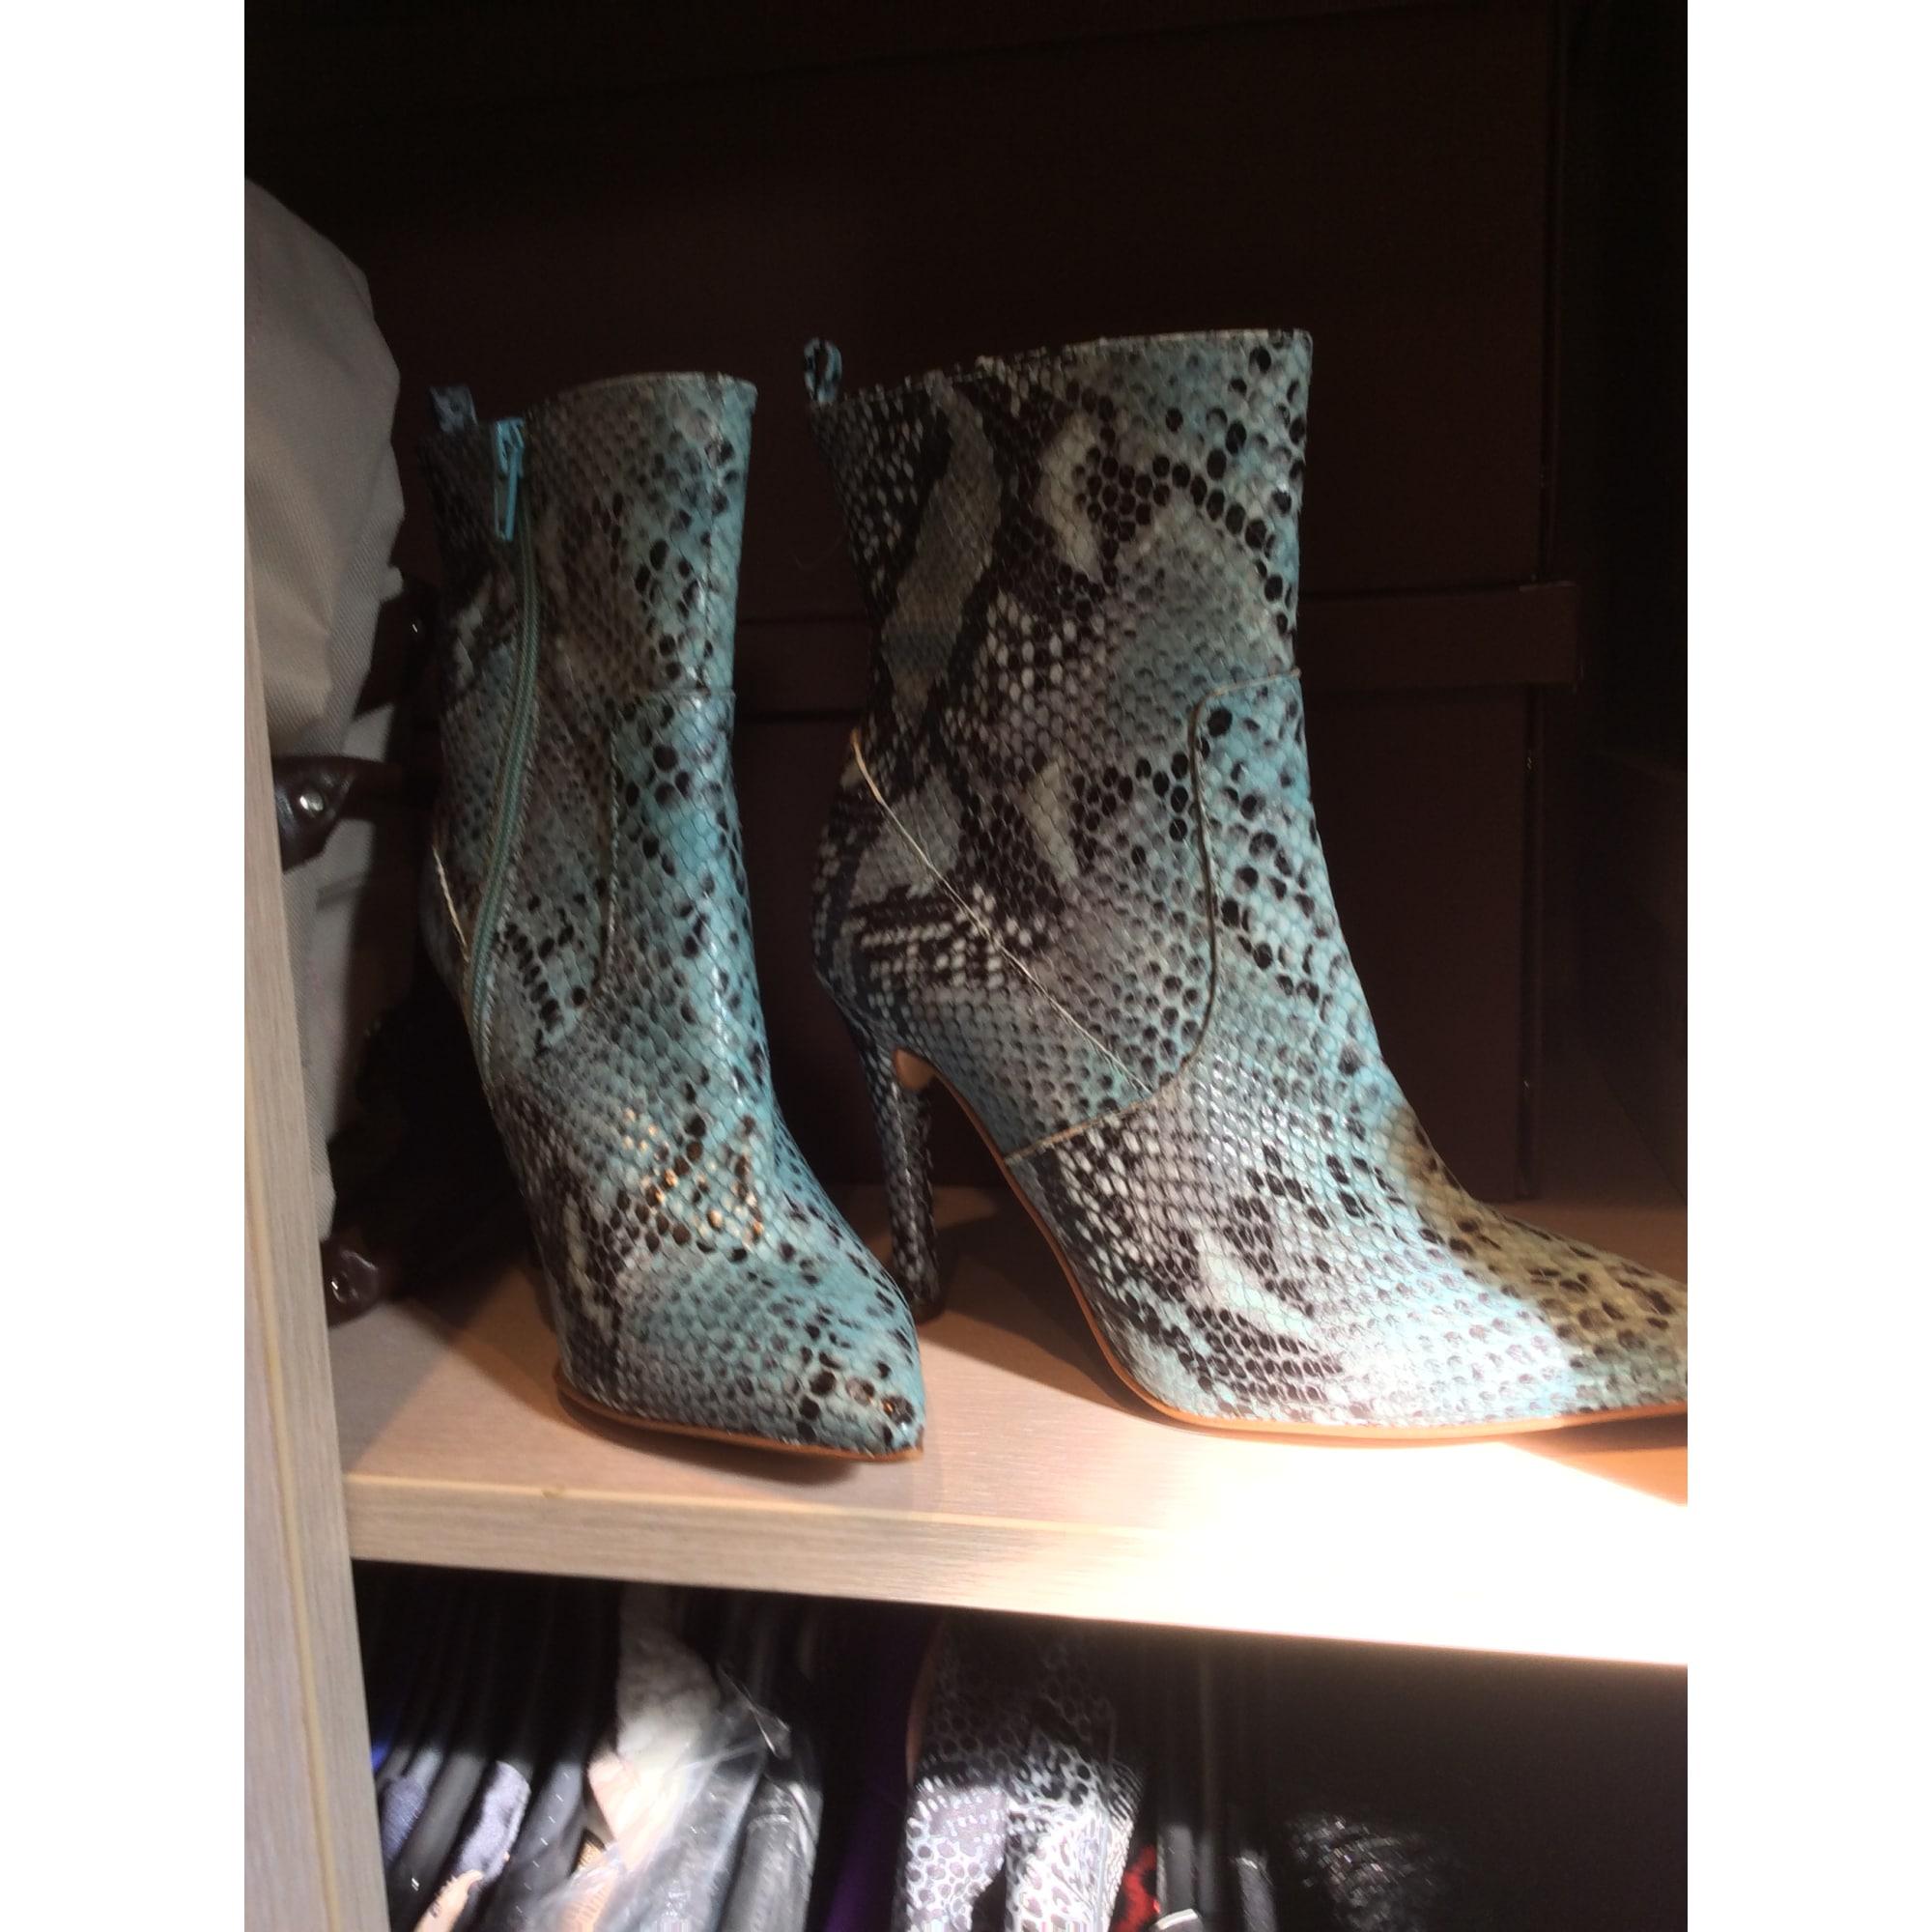 Bottines & low boots à talons MAI PIU SENZA Bleu, bleu marine, bleu turquoise